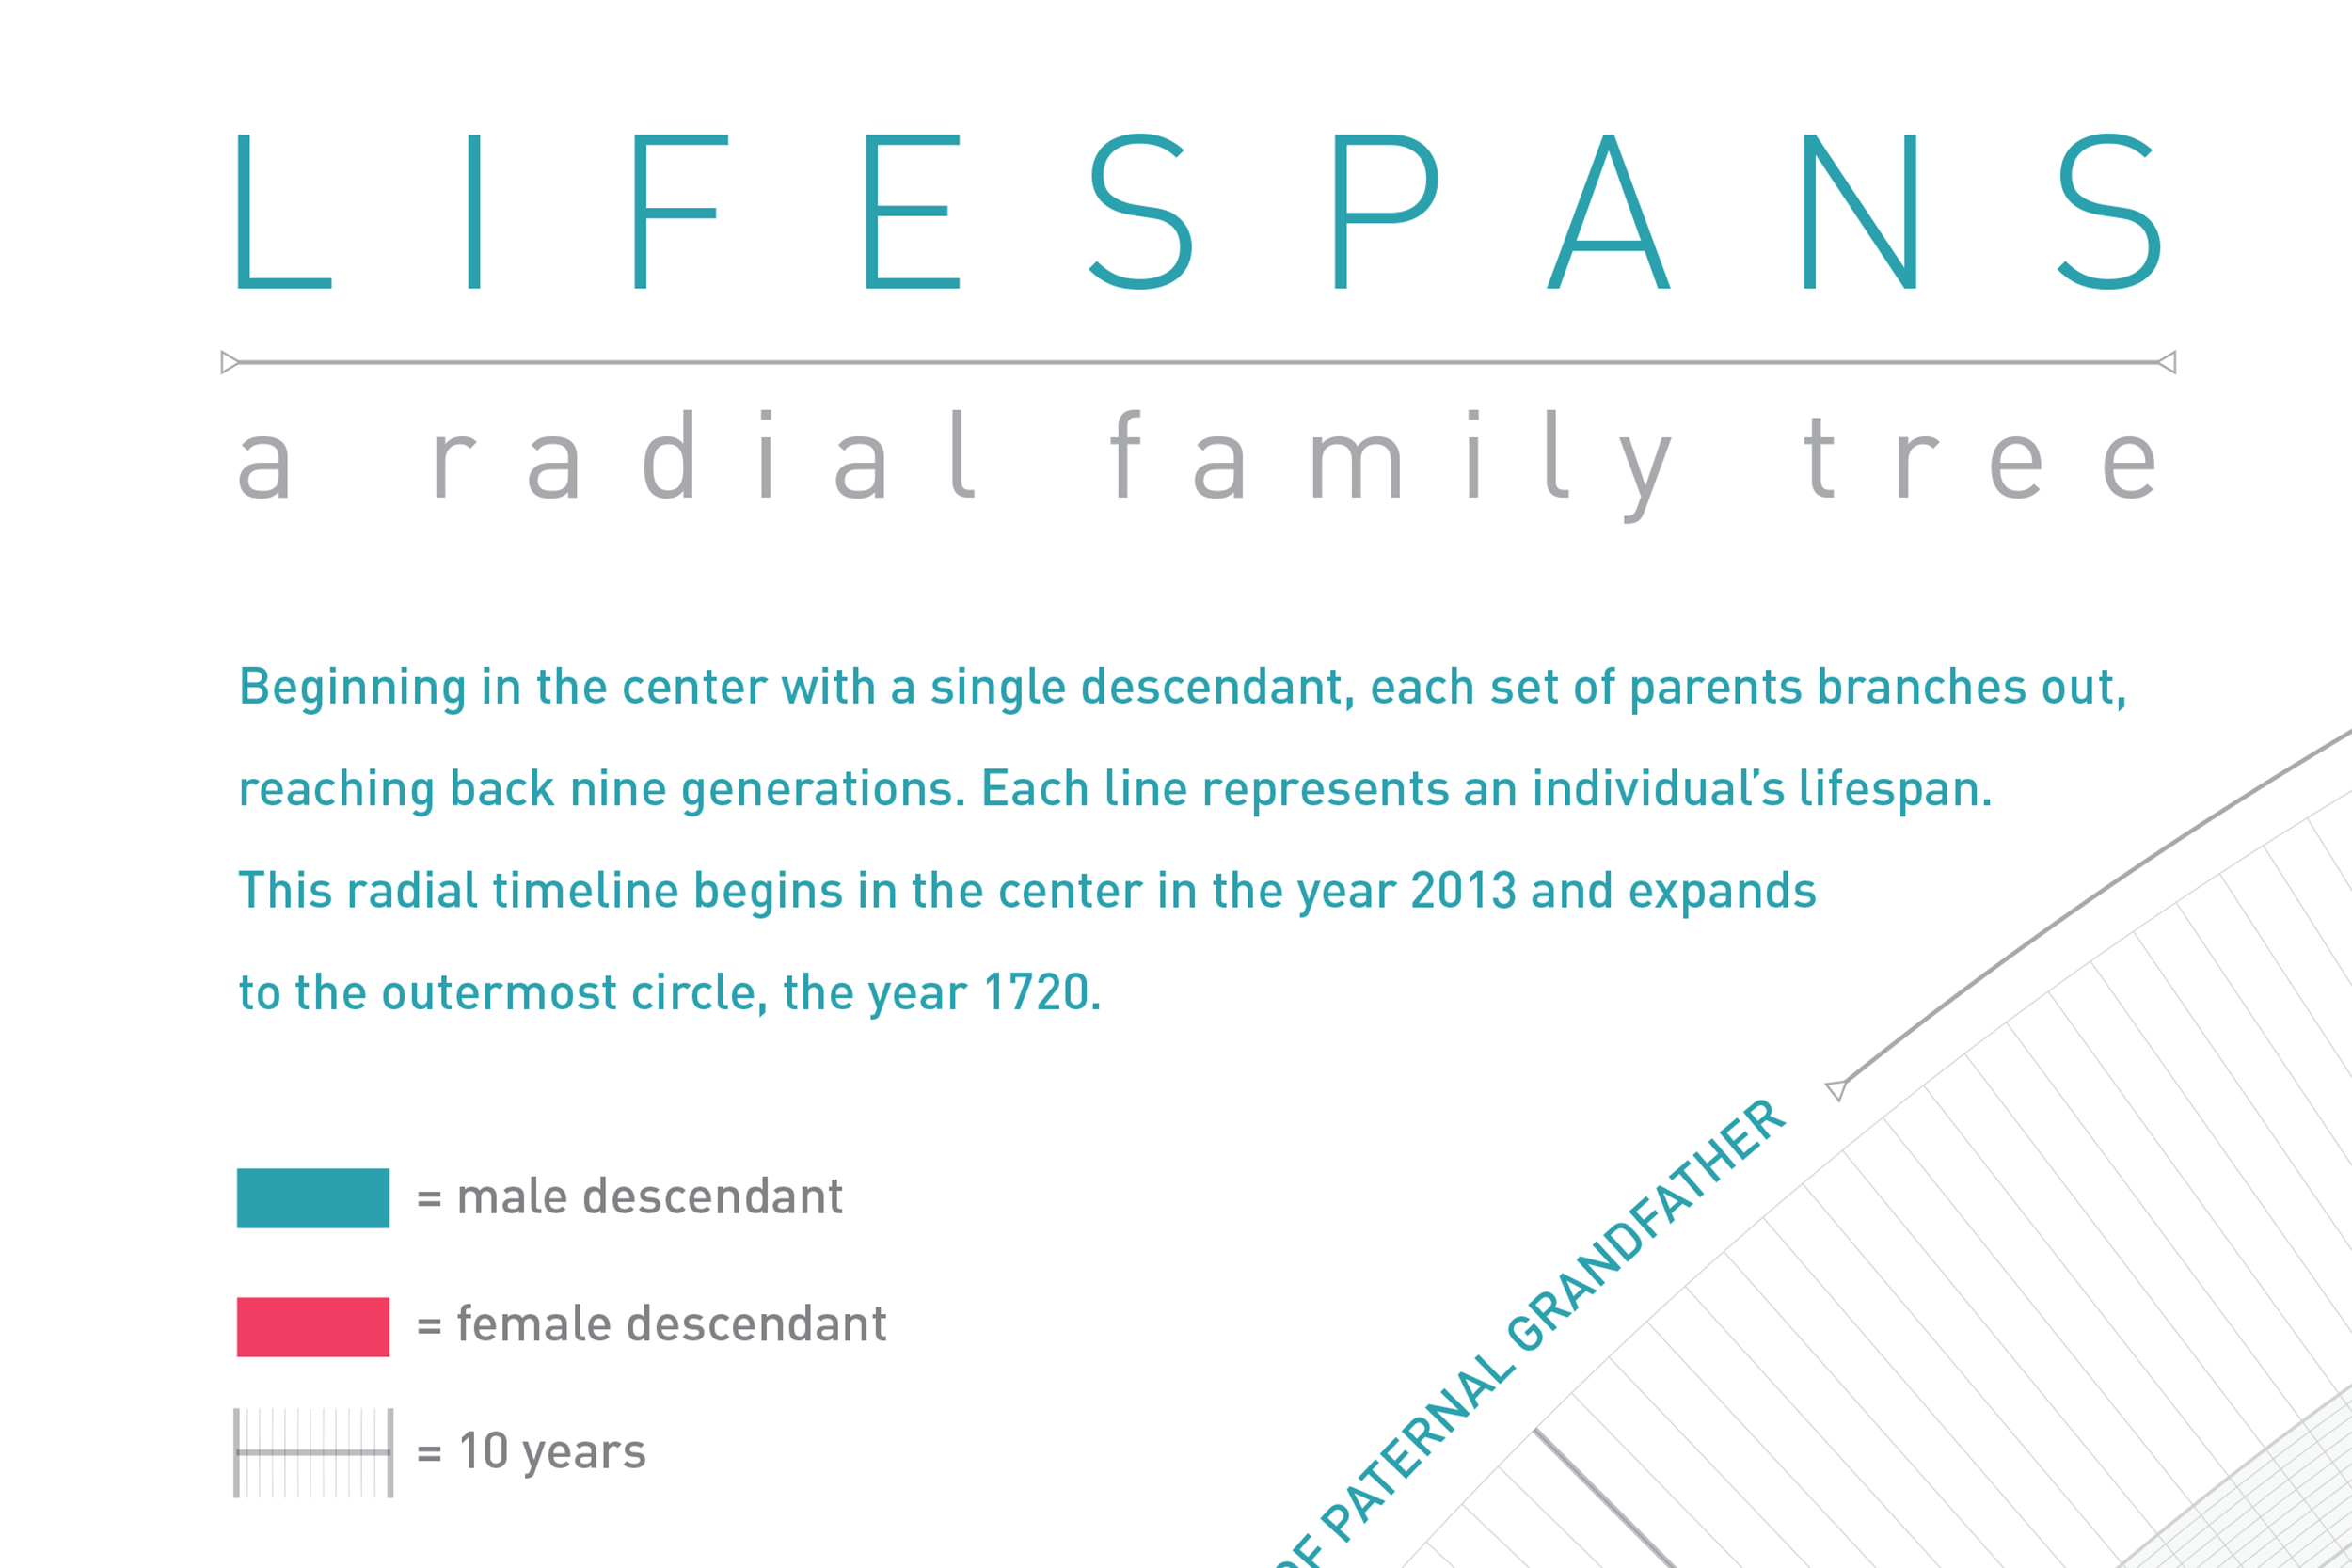 Lifespans_Barr_1.png